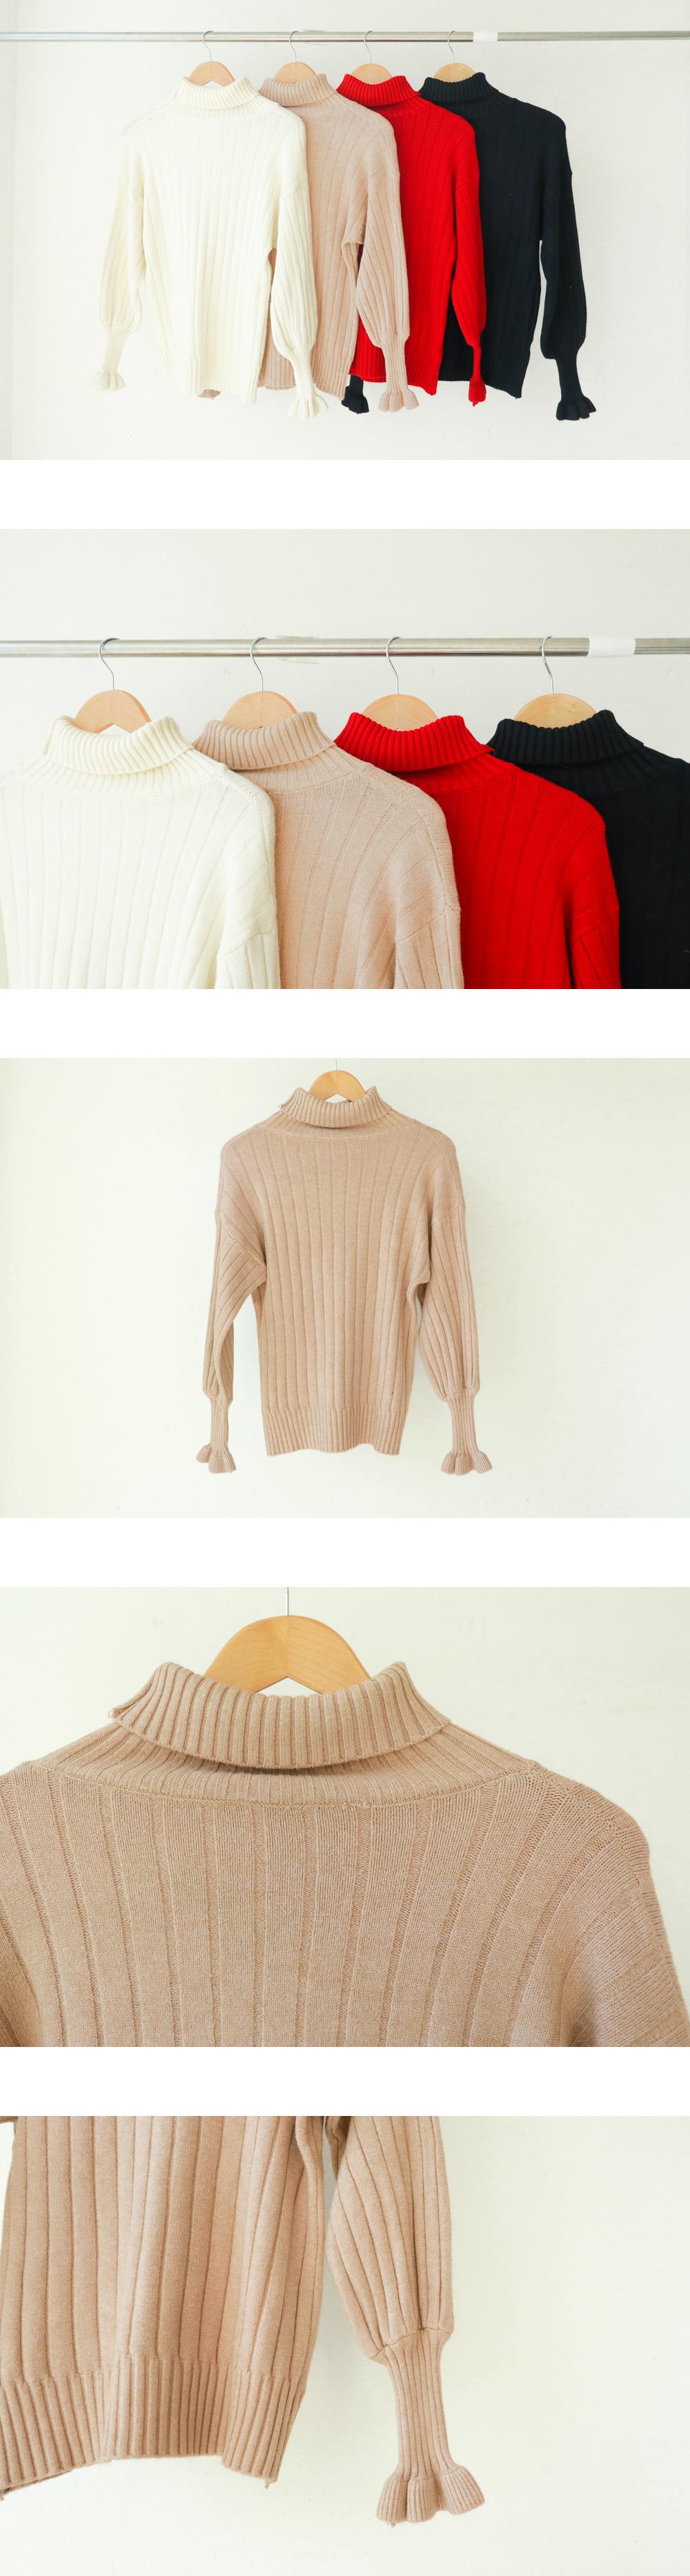 1923 sleeve frill polar knit